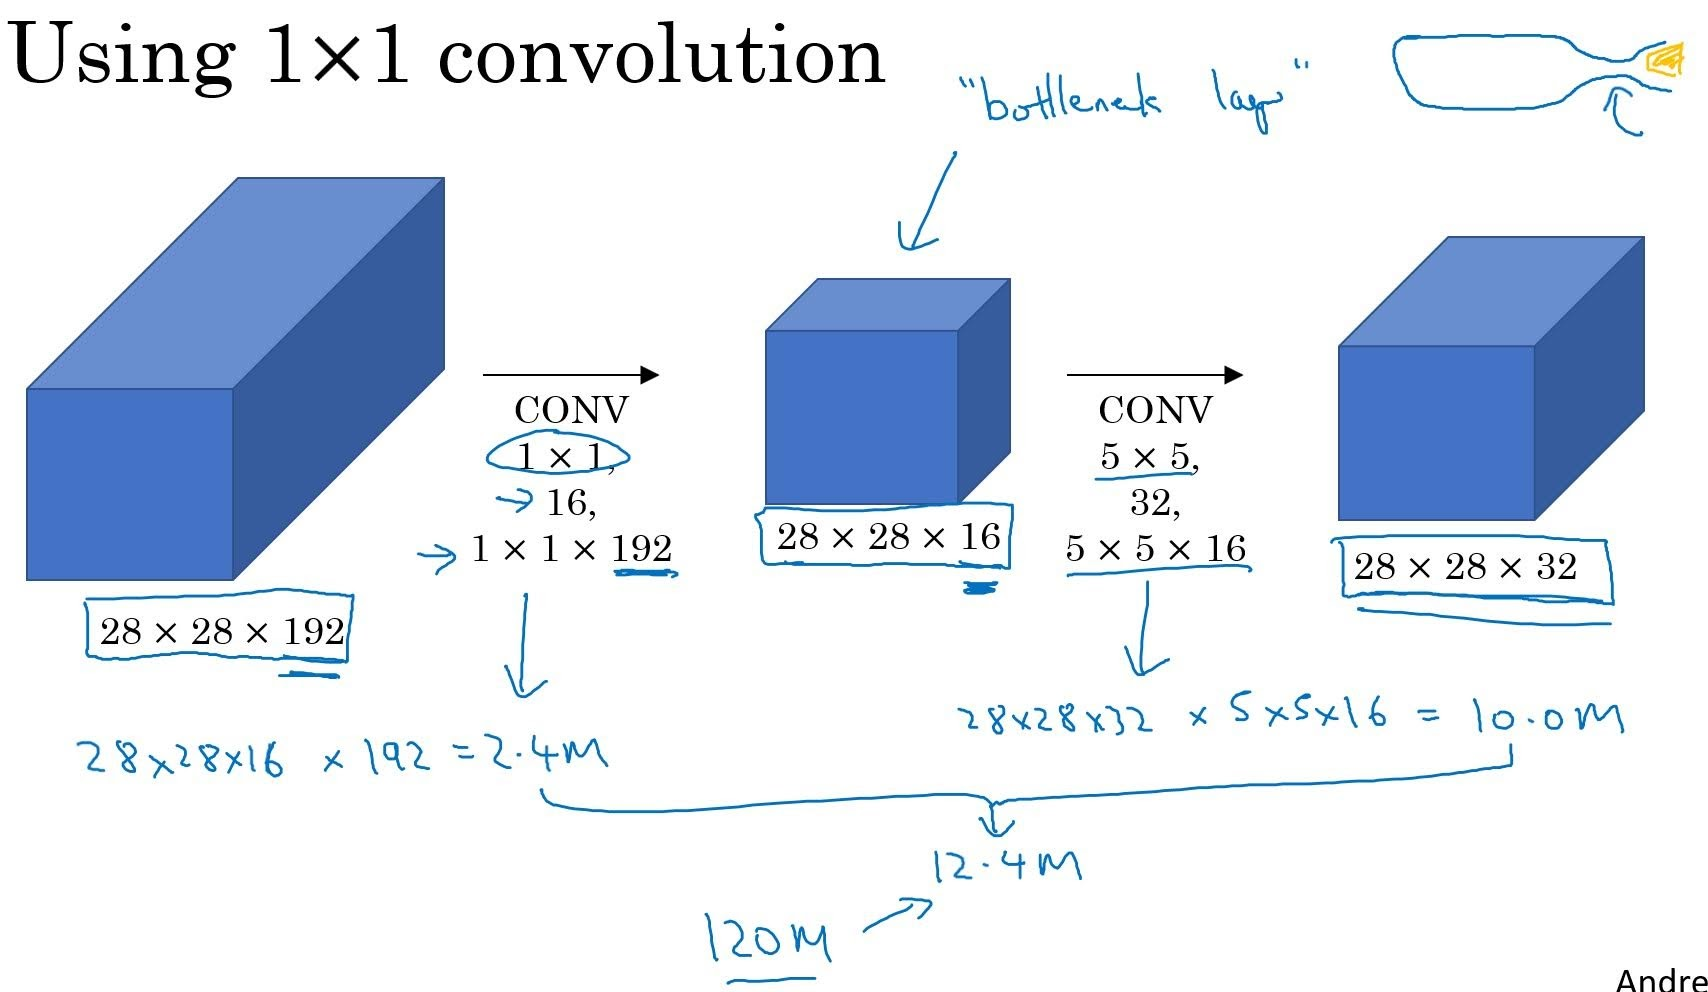 bottleneck layer